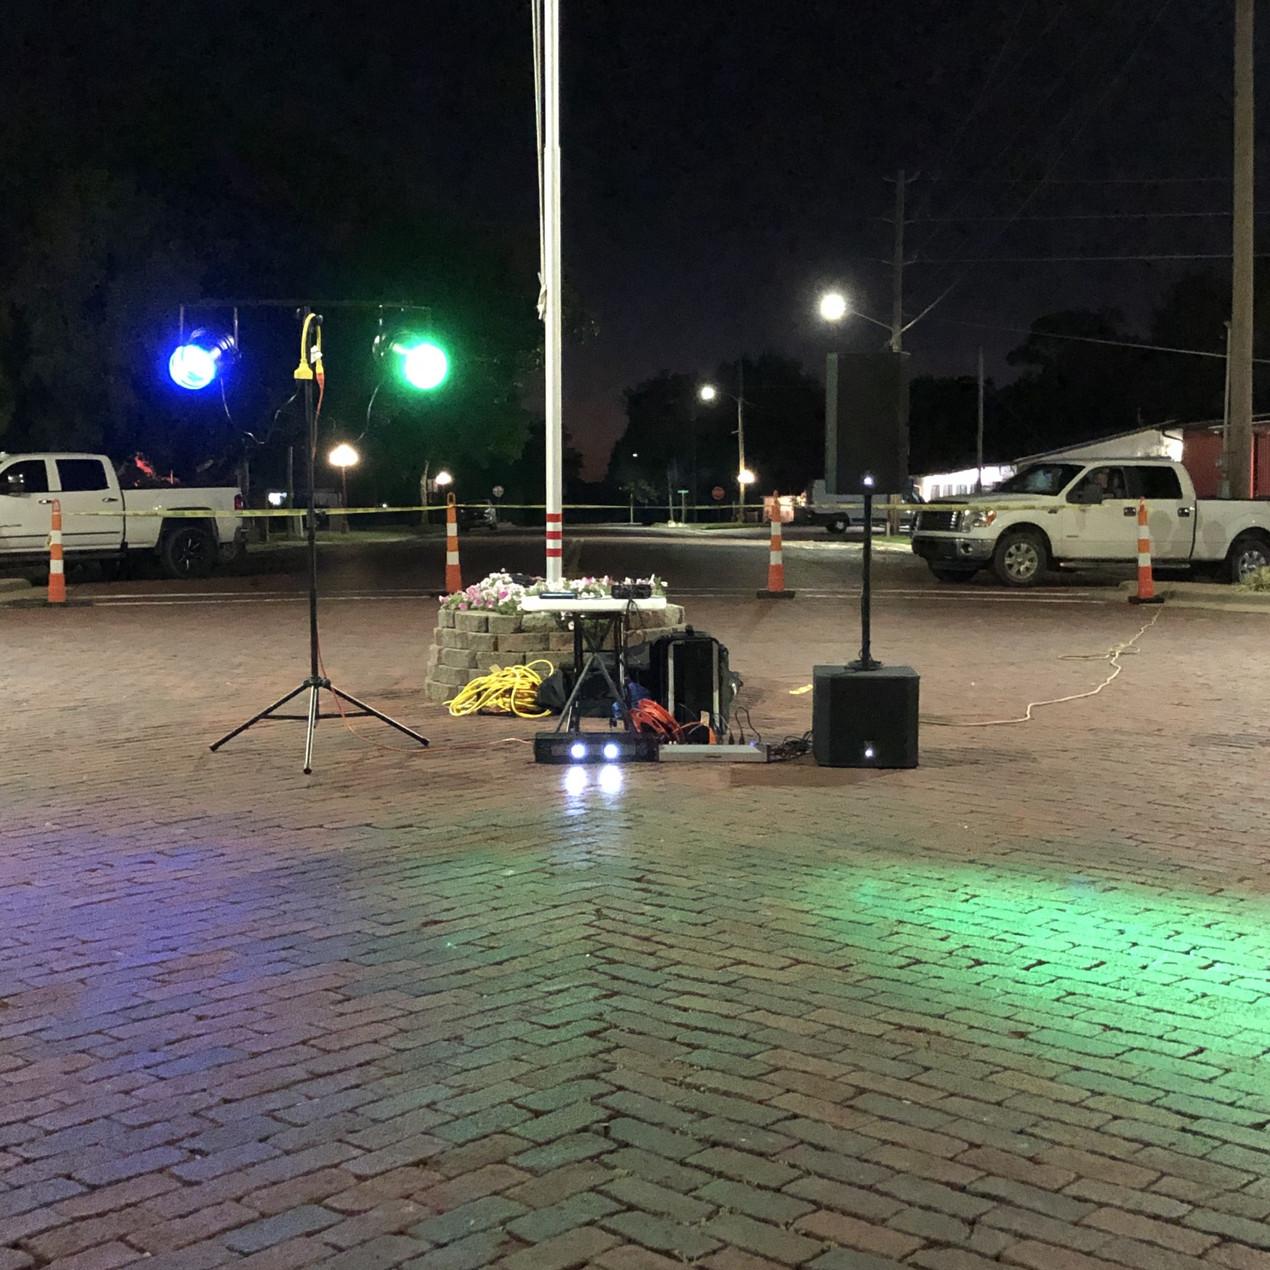 Sound System & Lighting setup for the street dance.